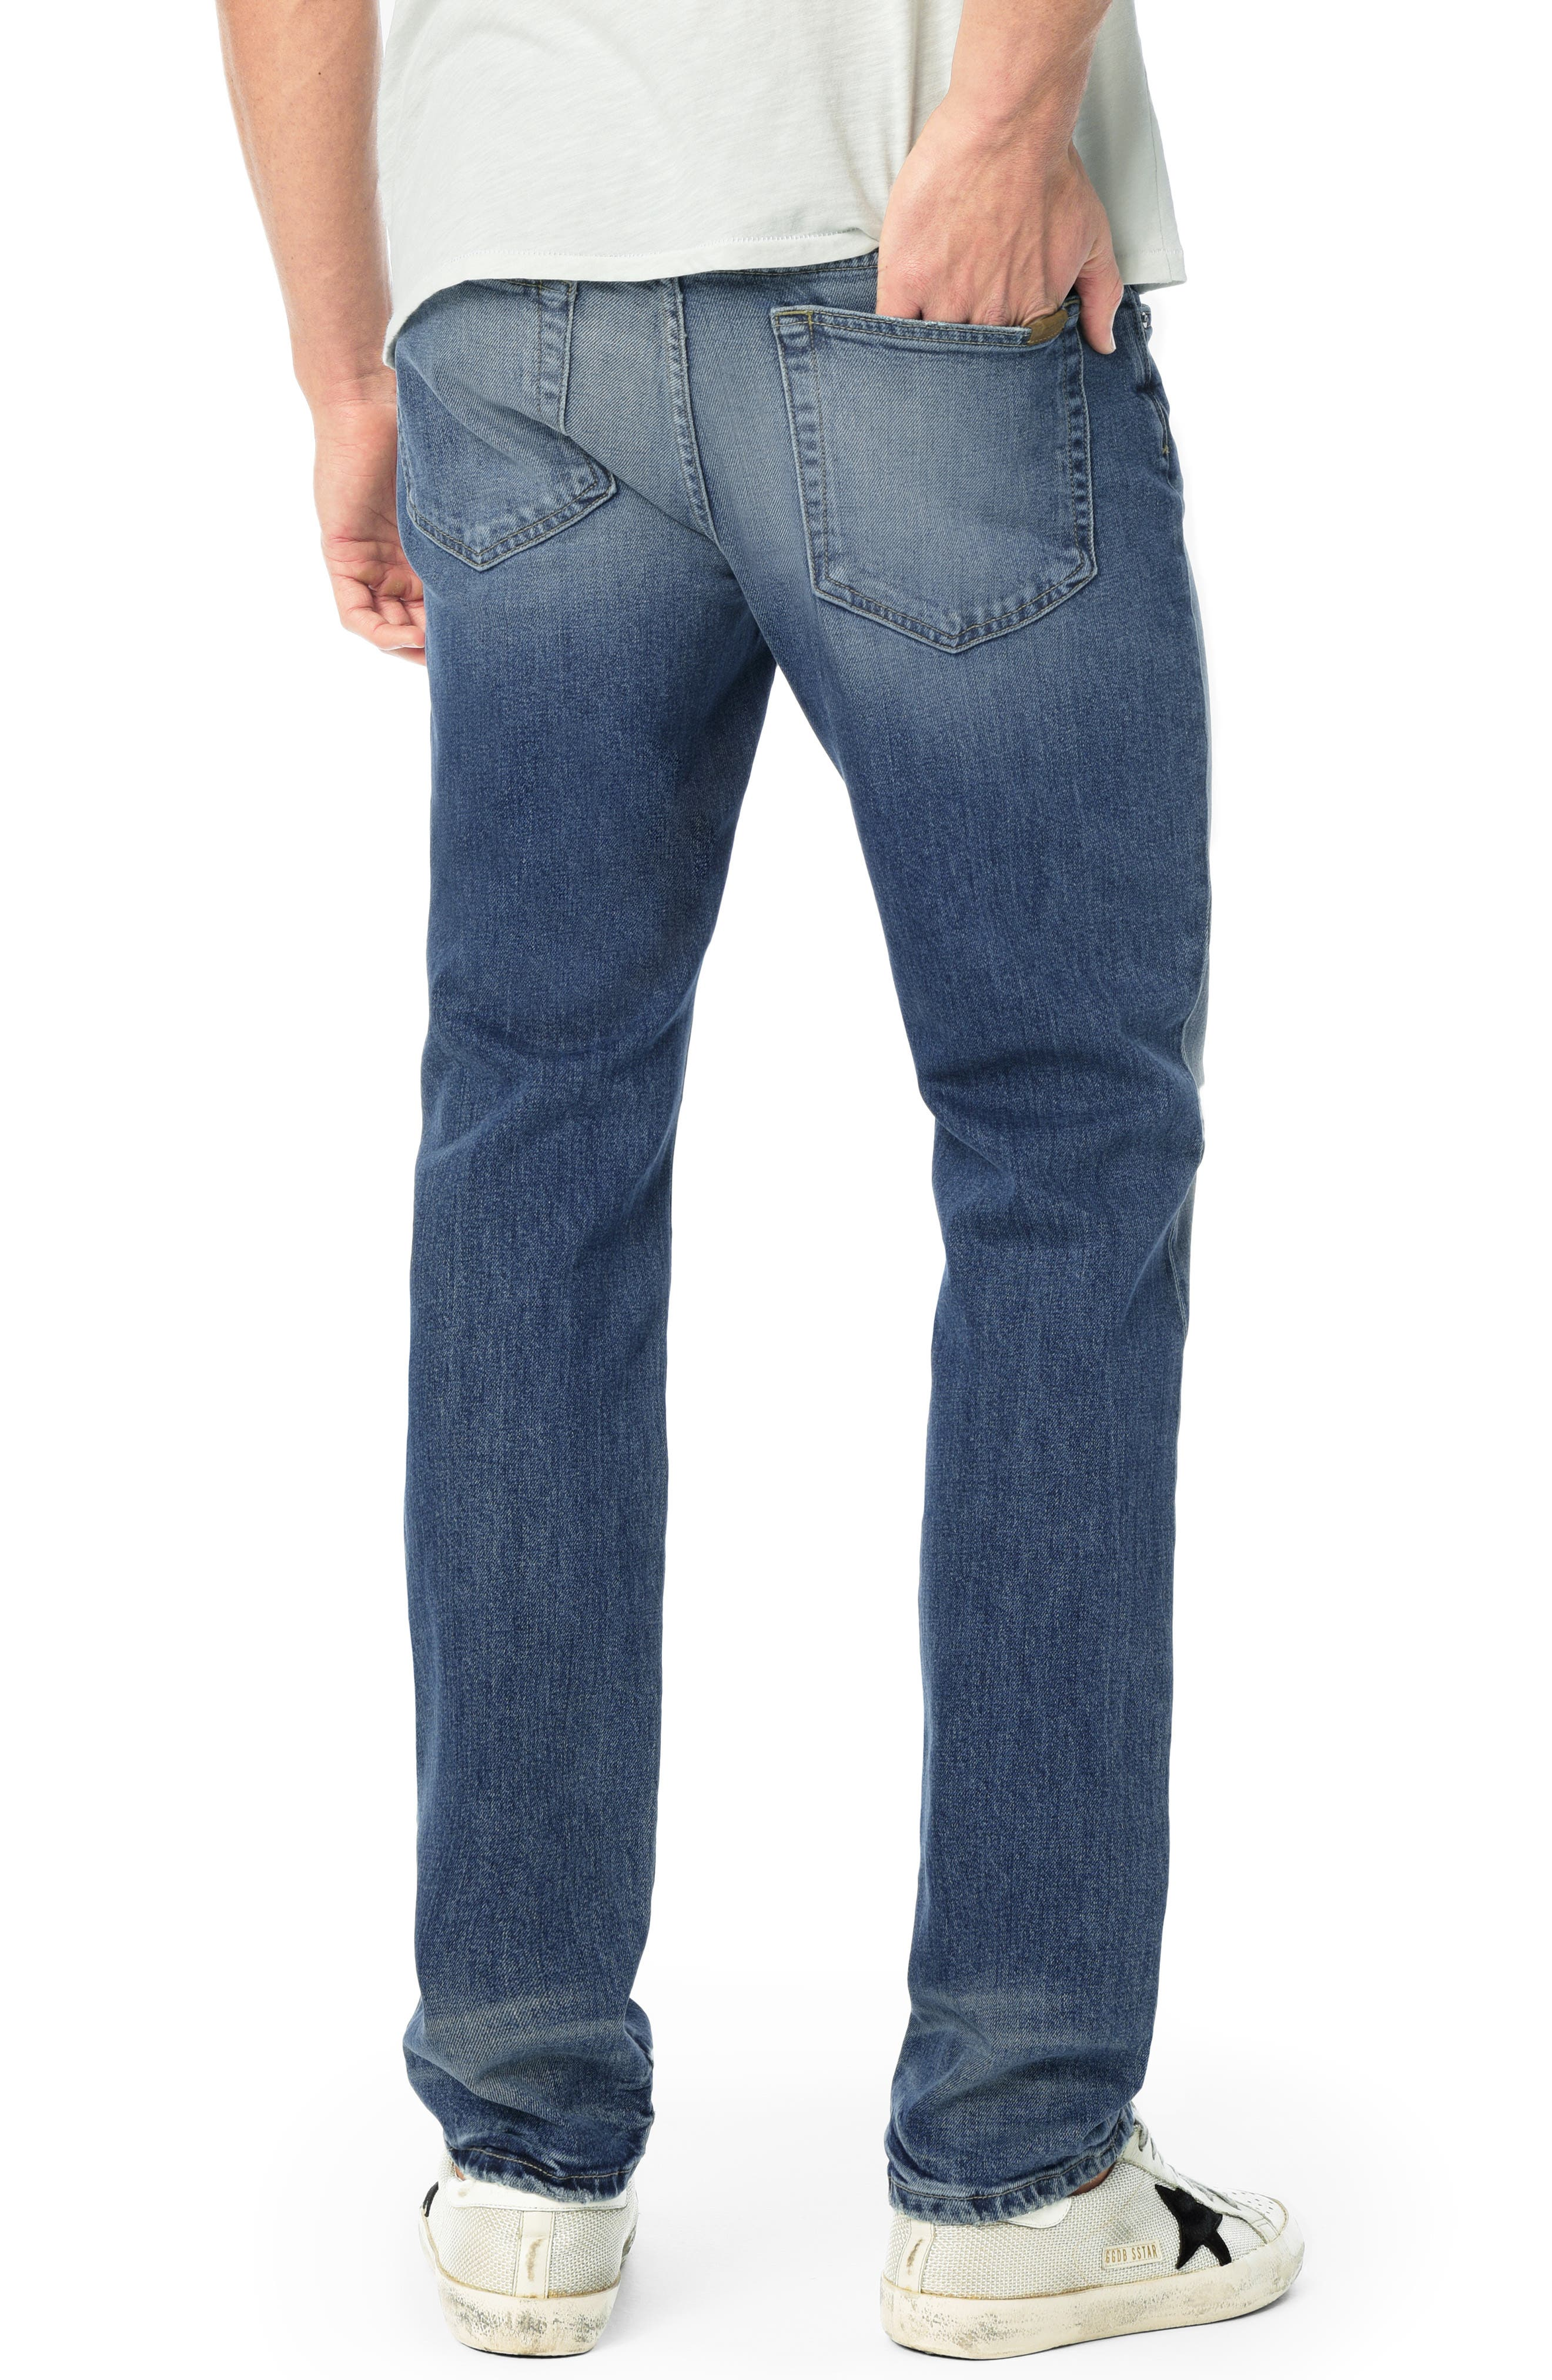 Brixton Slim Straight Leg Jeans,                             Alternate thumbnail 2, color,                             HARPO